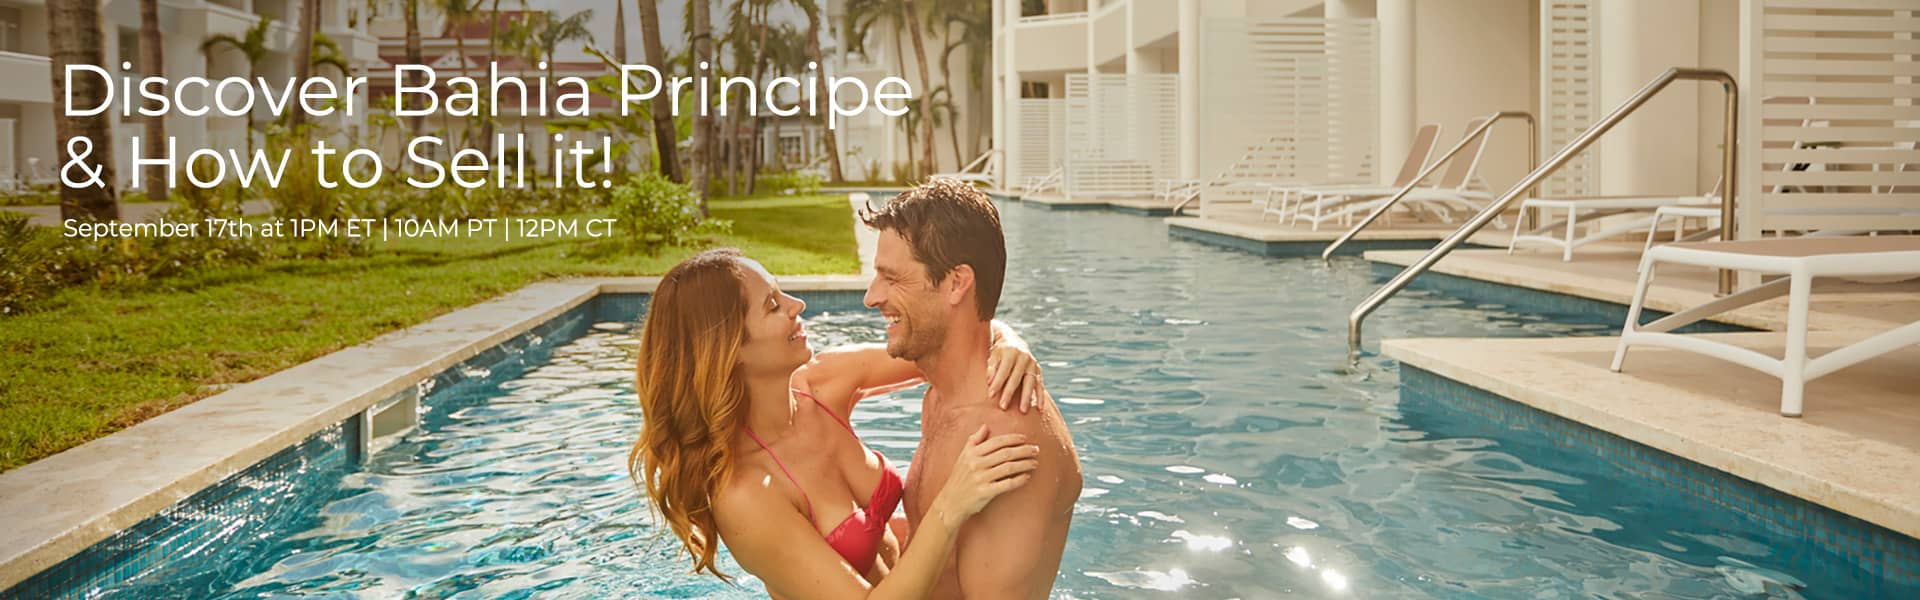 Discover Bahia Principe & How to Sell it